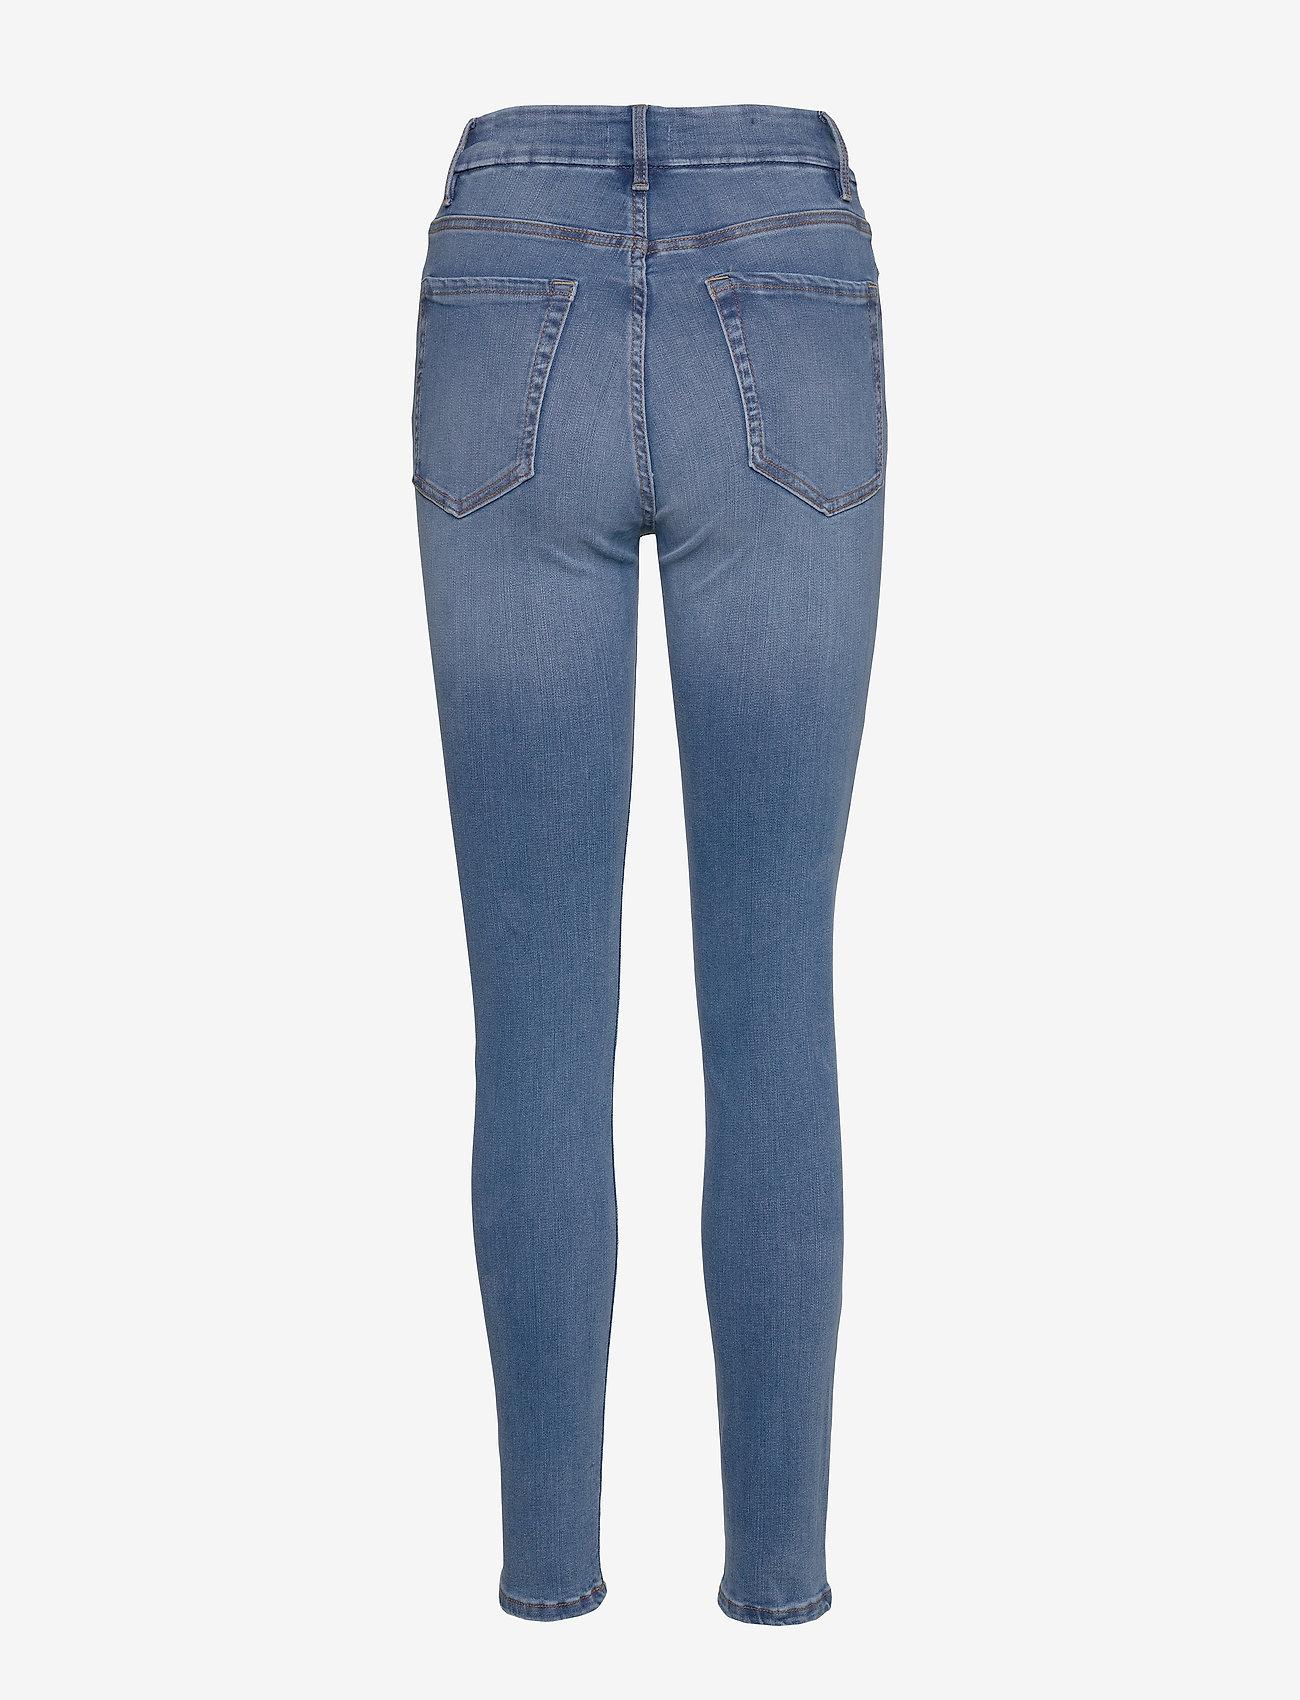 Lindex - Trousers denim Clara blue - skinny jeans - denim - 1